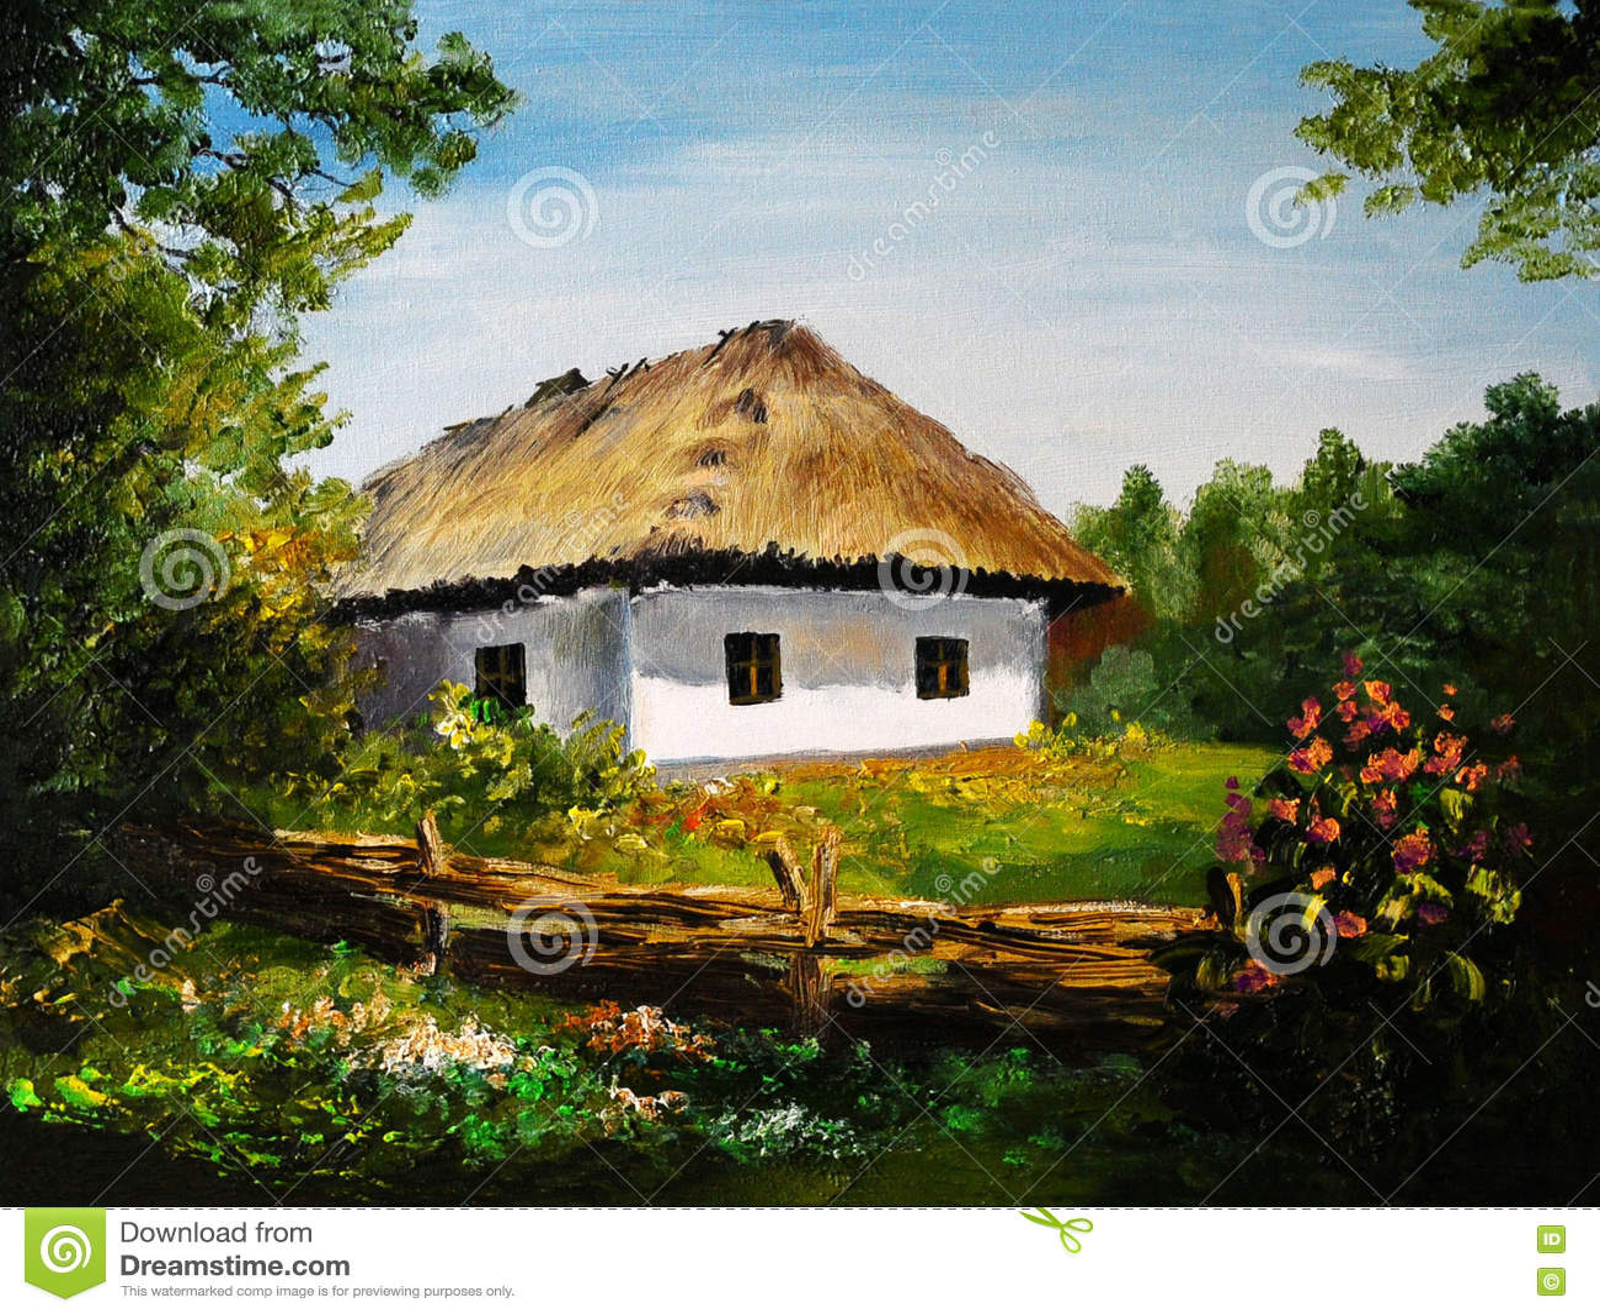 oil painting house in the village art work stock illustration